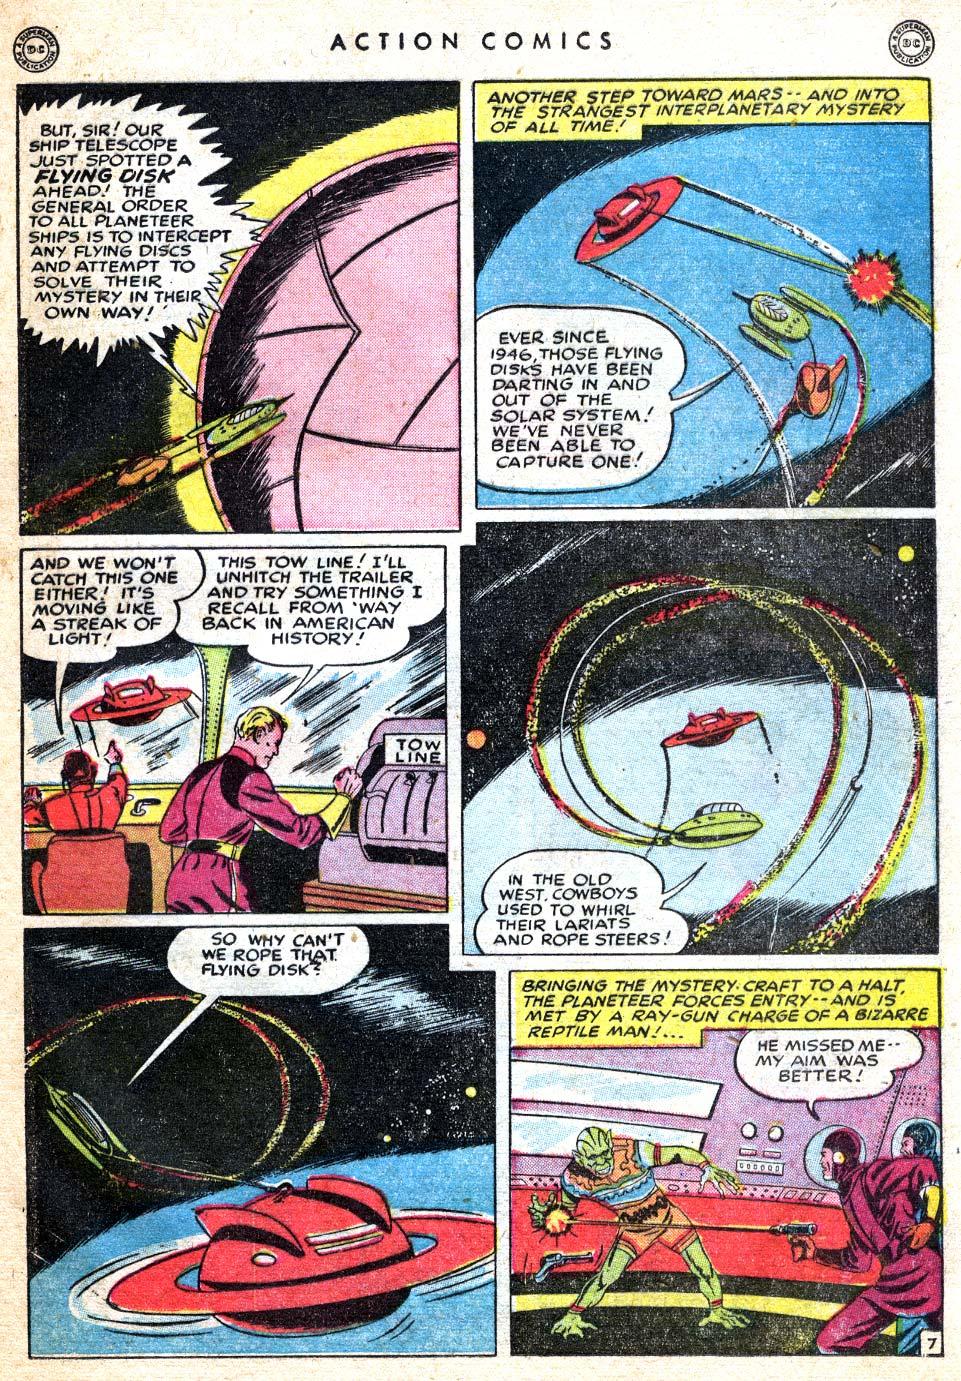 Action Comics (1938) 134 Page 22